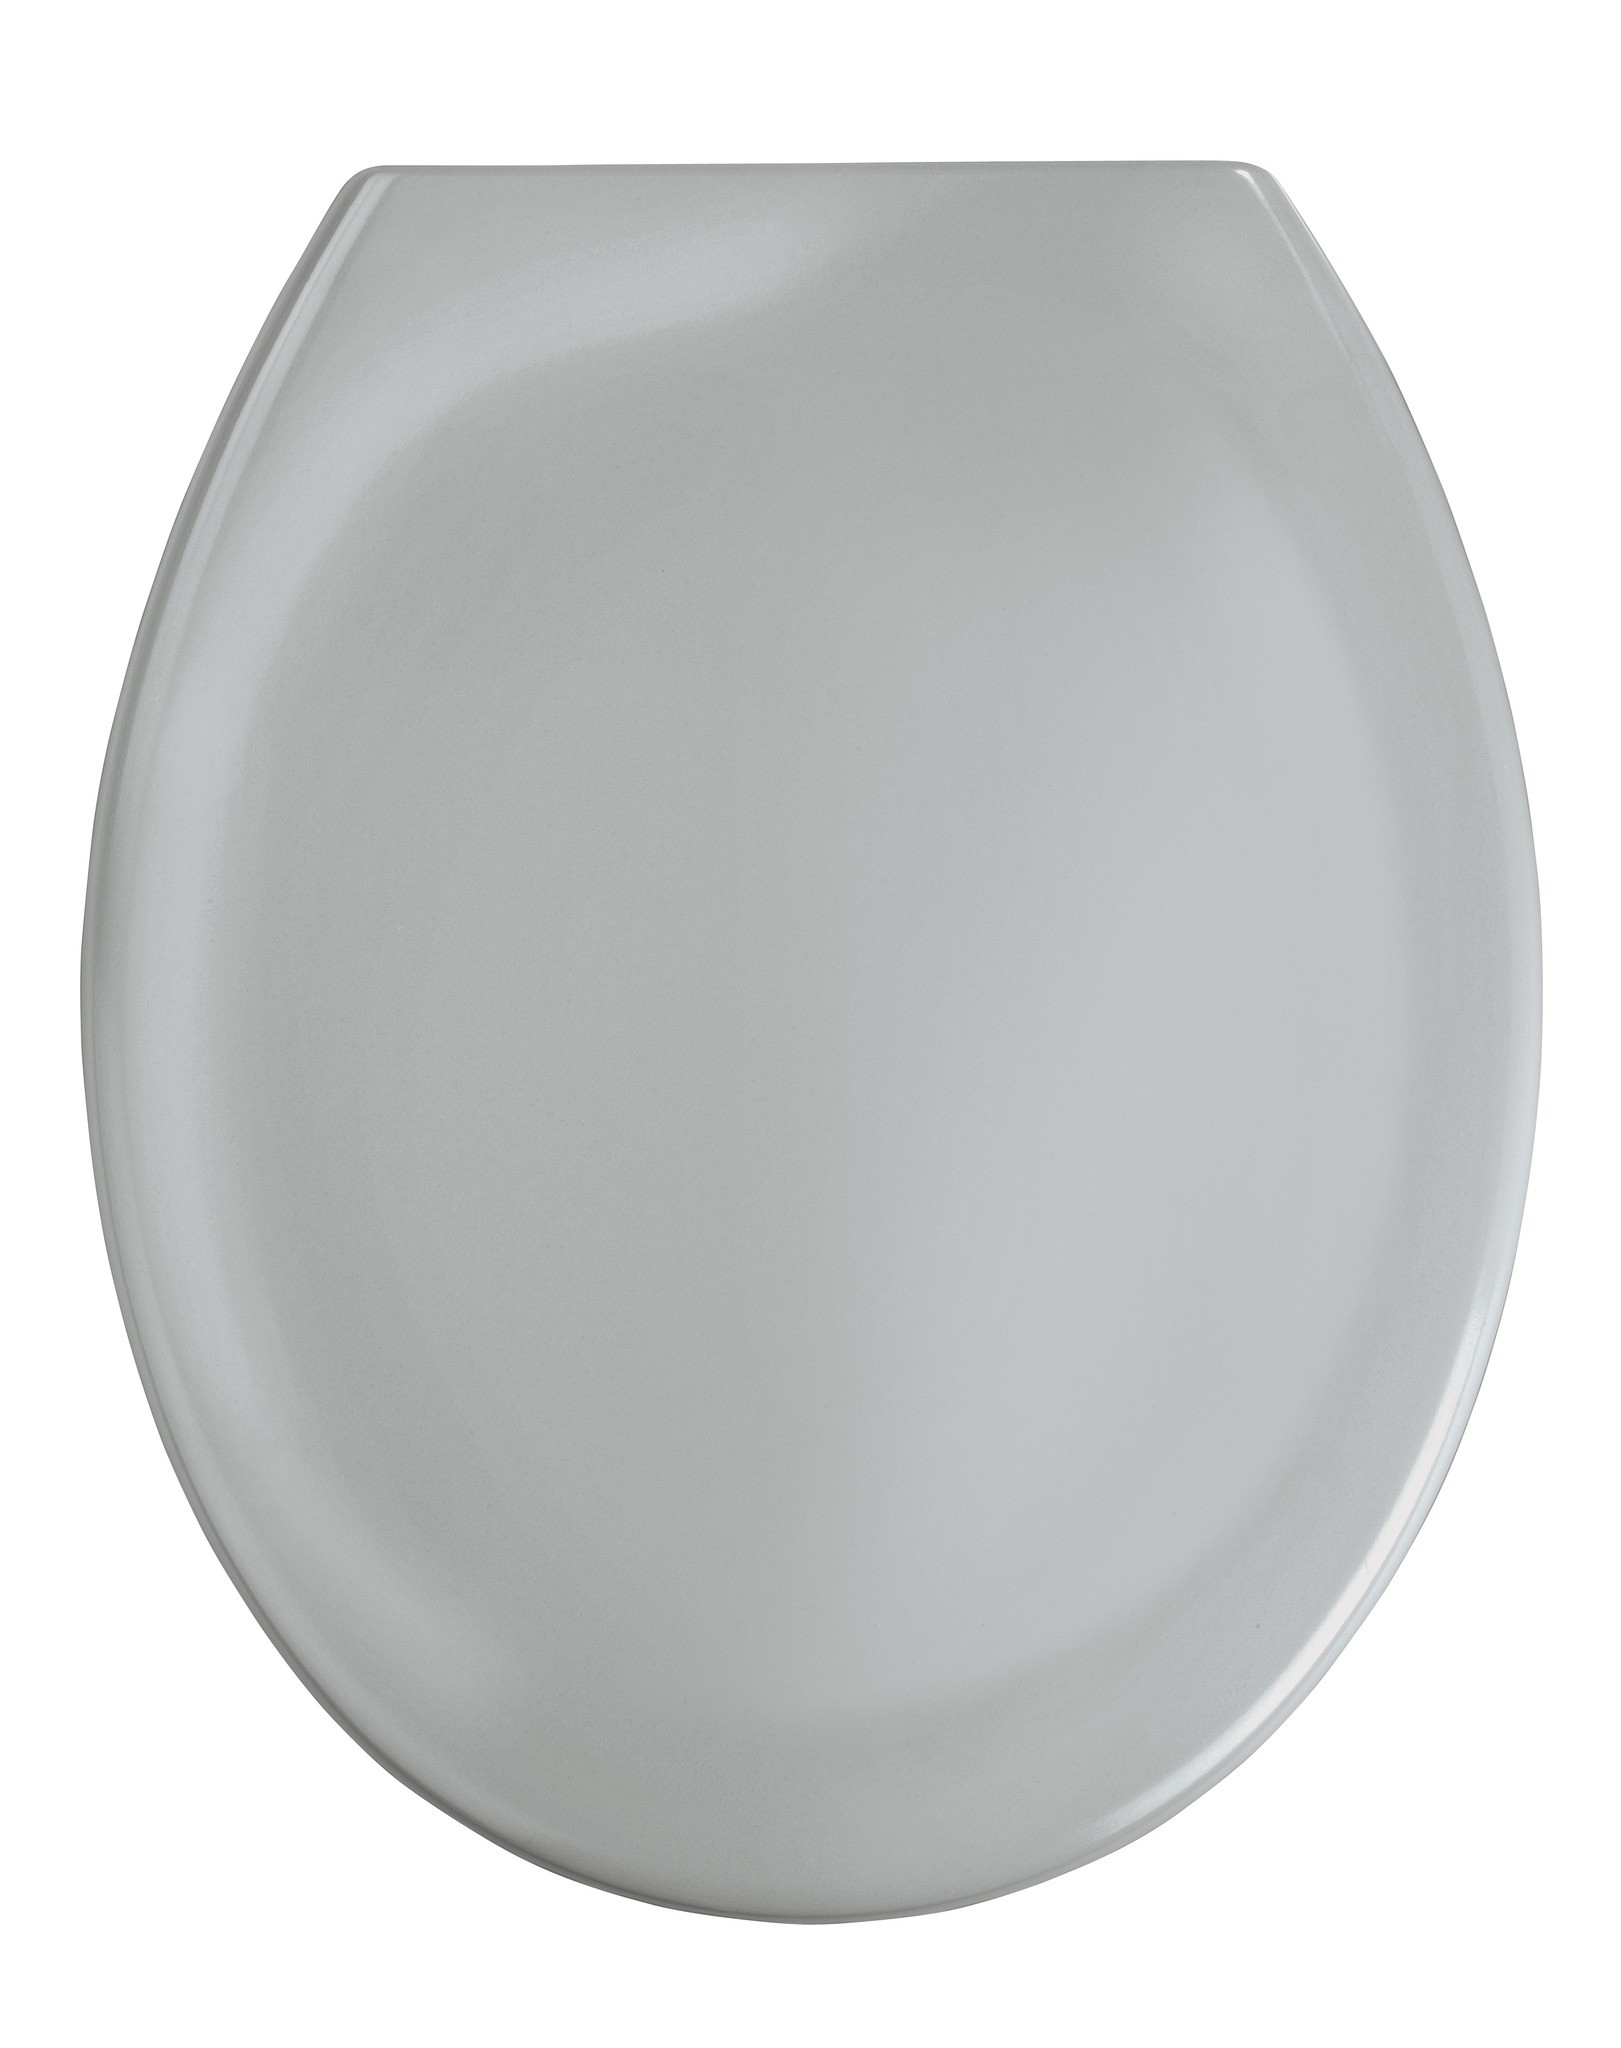 Premium WC-Sitz Ottana Hellgrau, mit Absenkautomatik